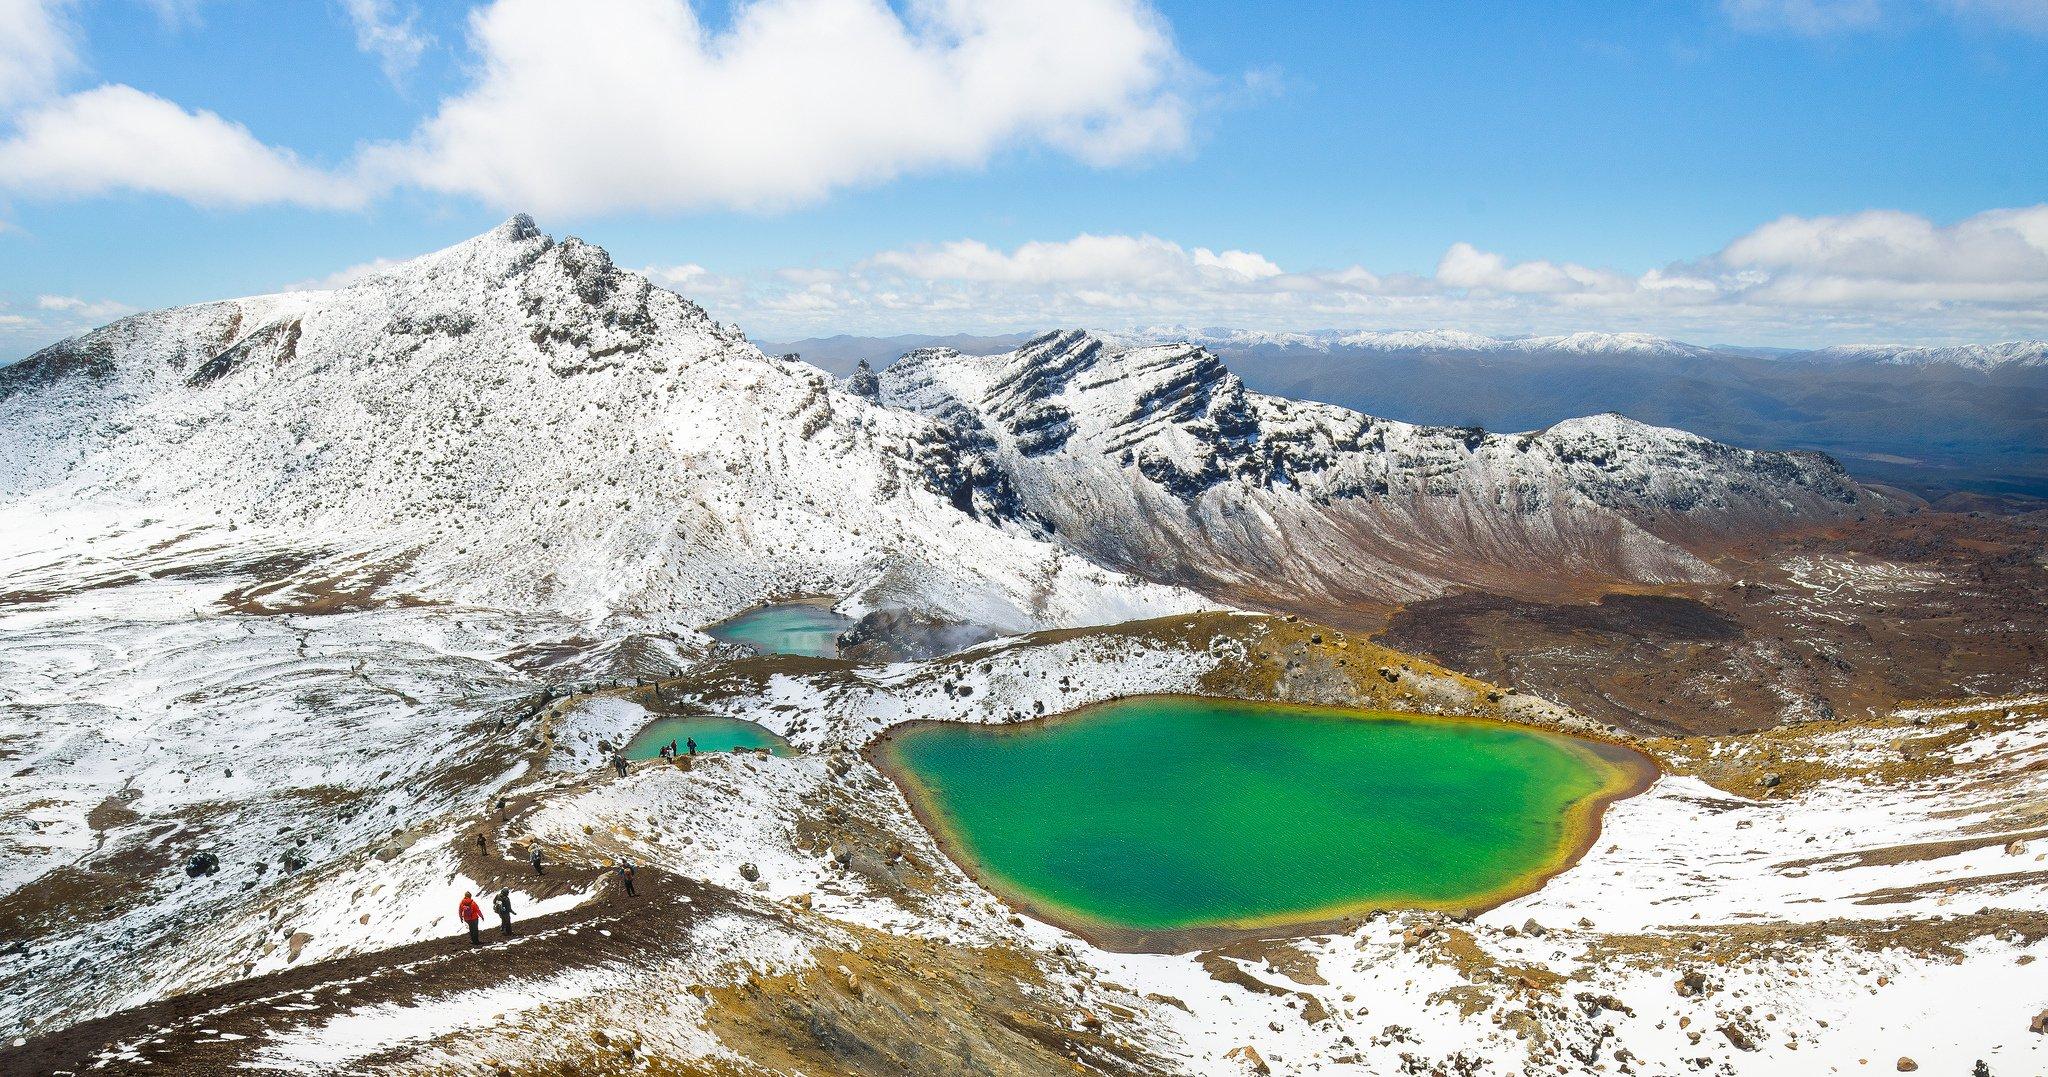 Tongariro National Park New Zealand  city photos gallery : Mountain lake snow Tongariro National Park North Island New Zealand ...